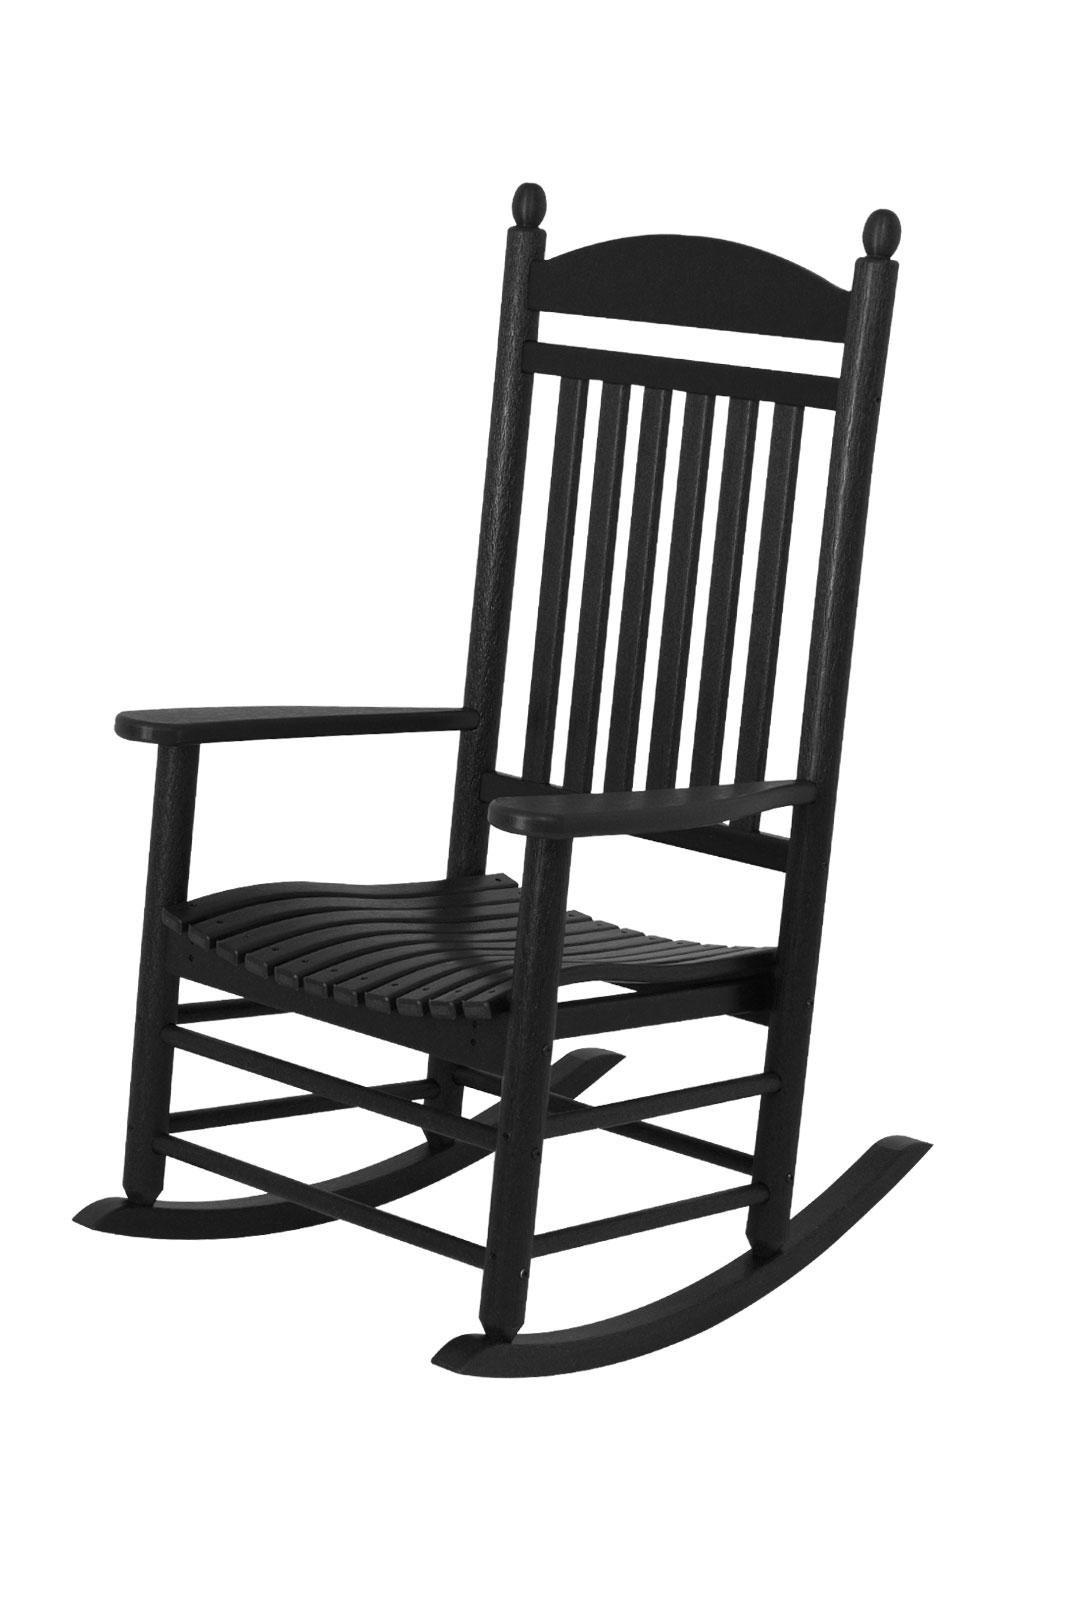 jefferson recycled plastic rocker chair black